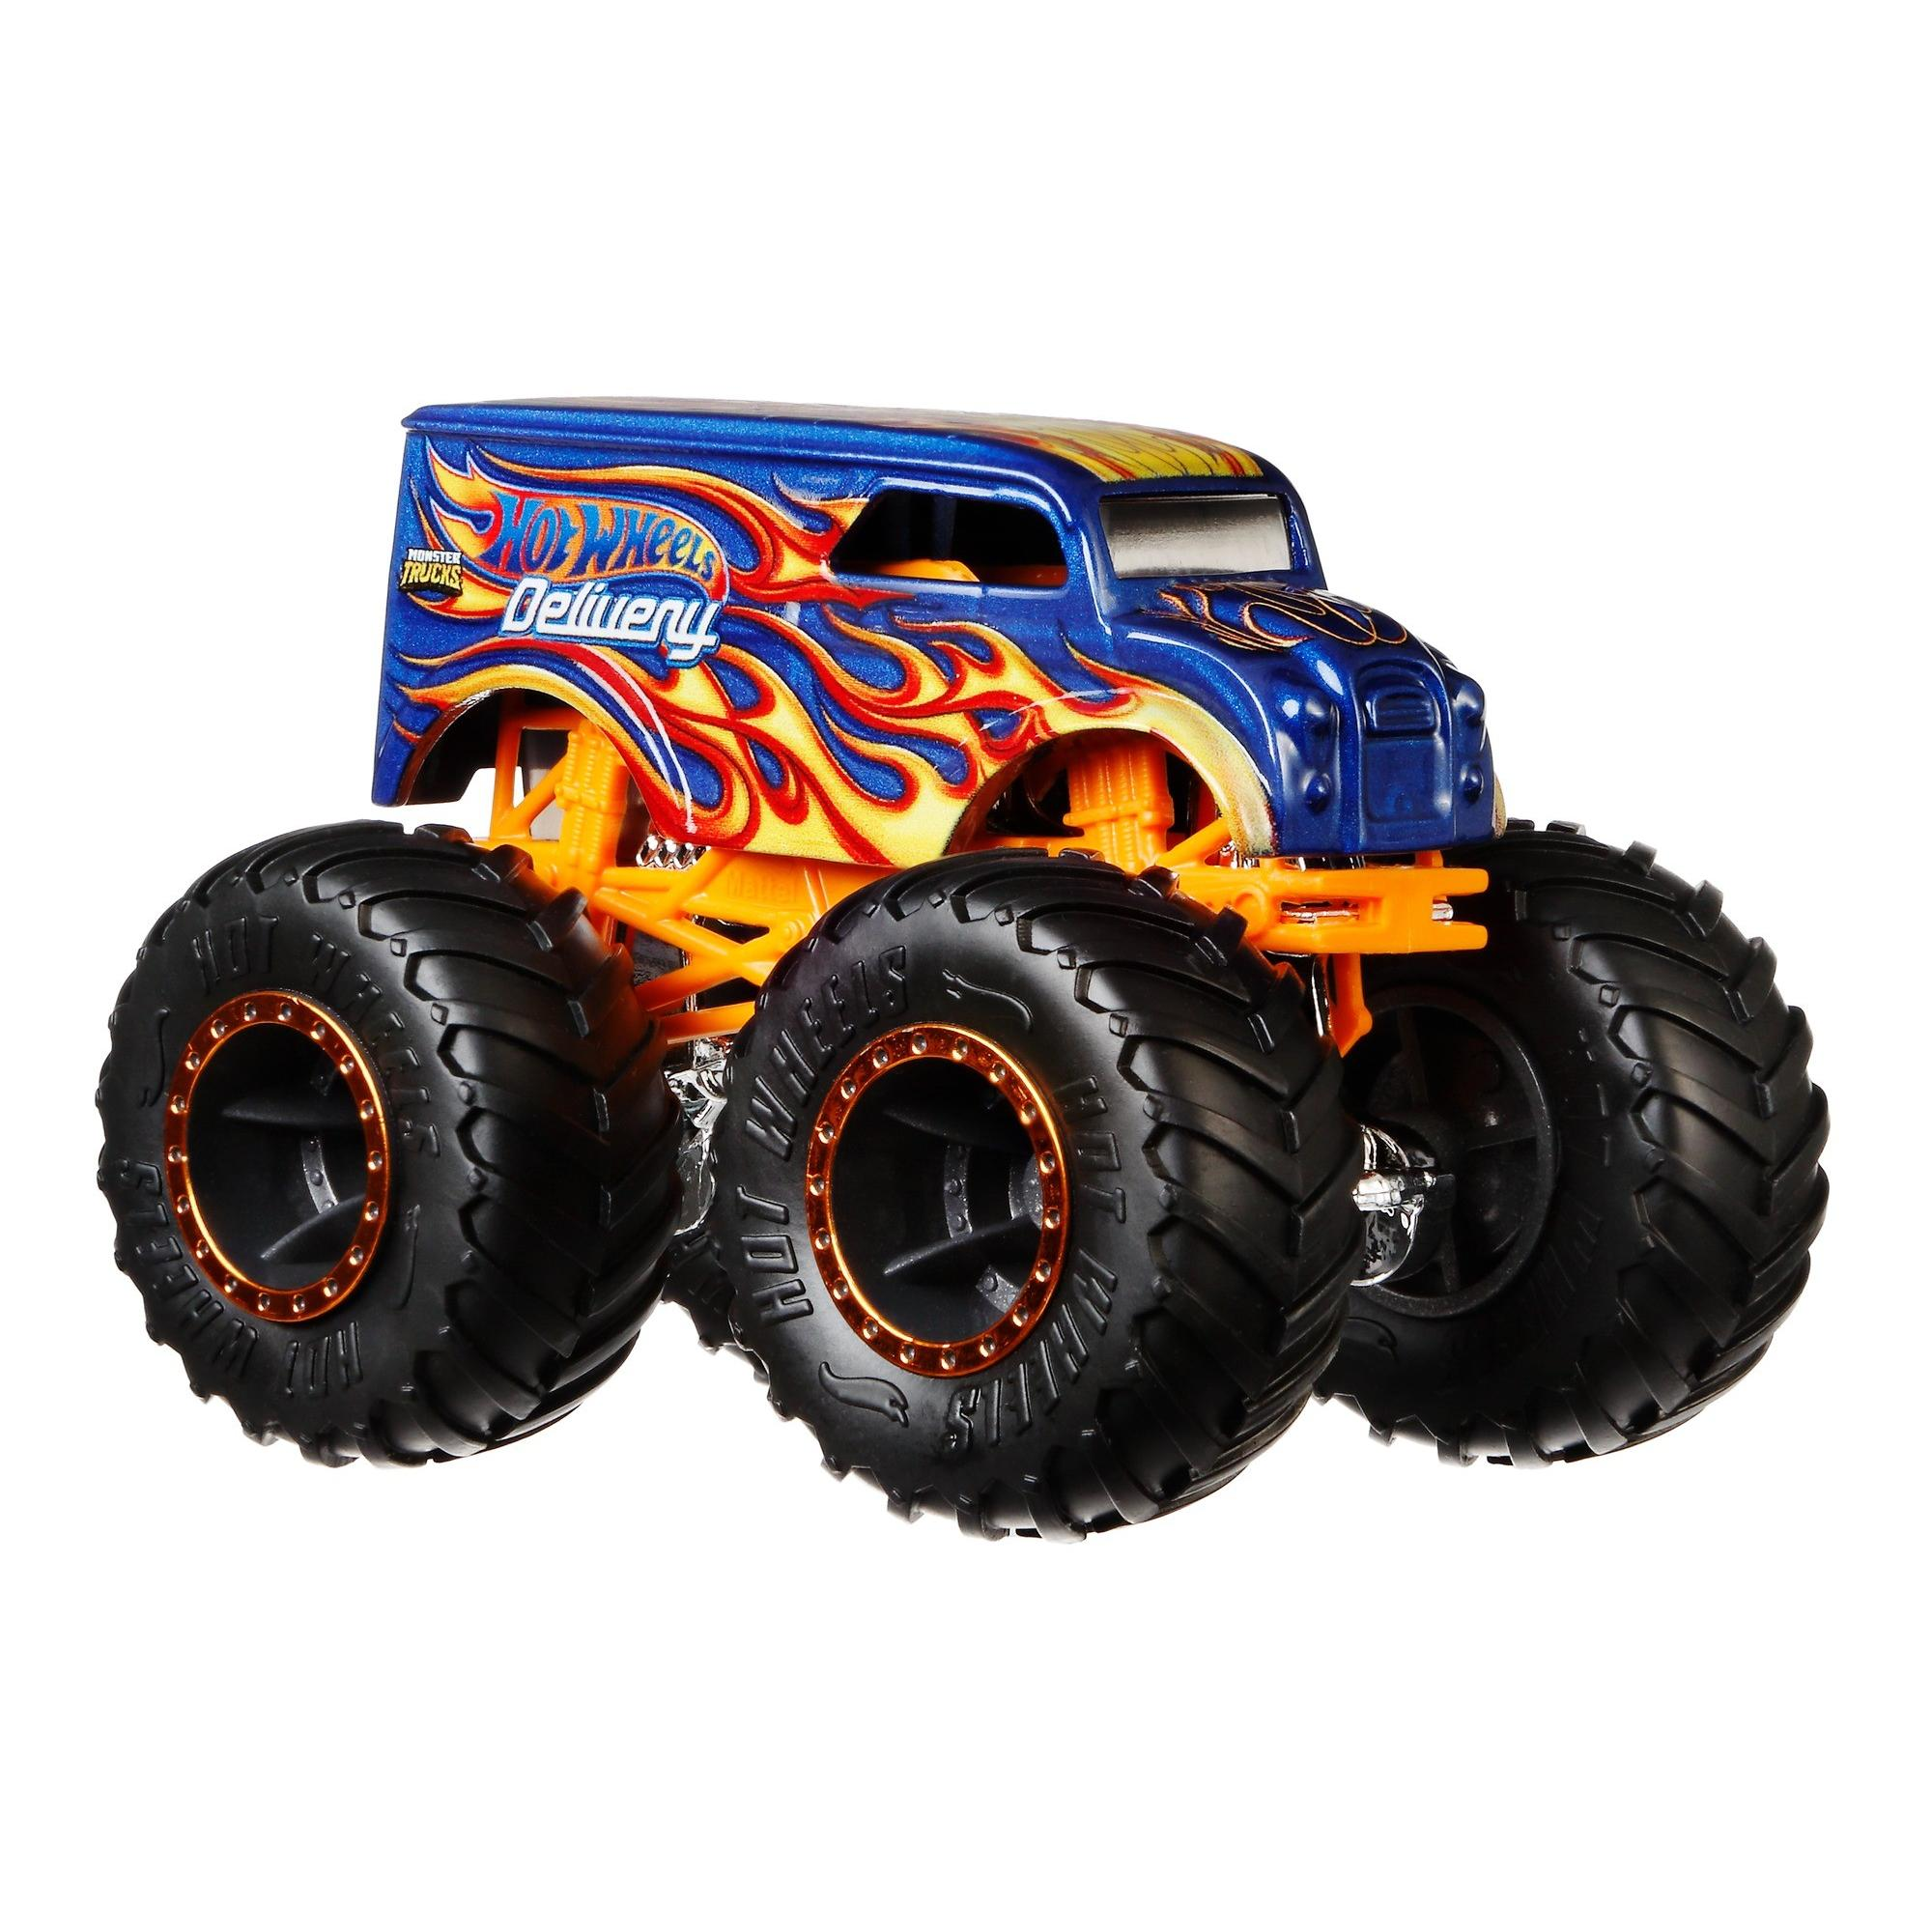 Hot Wheels Monster Trucks 1:64 Scale Die-Cast Vehicle (Styles May Vary)